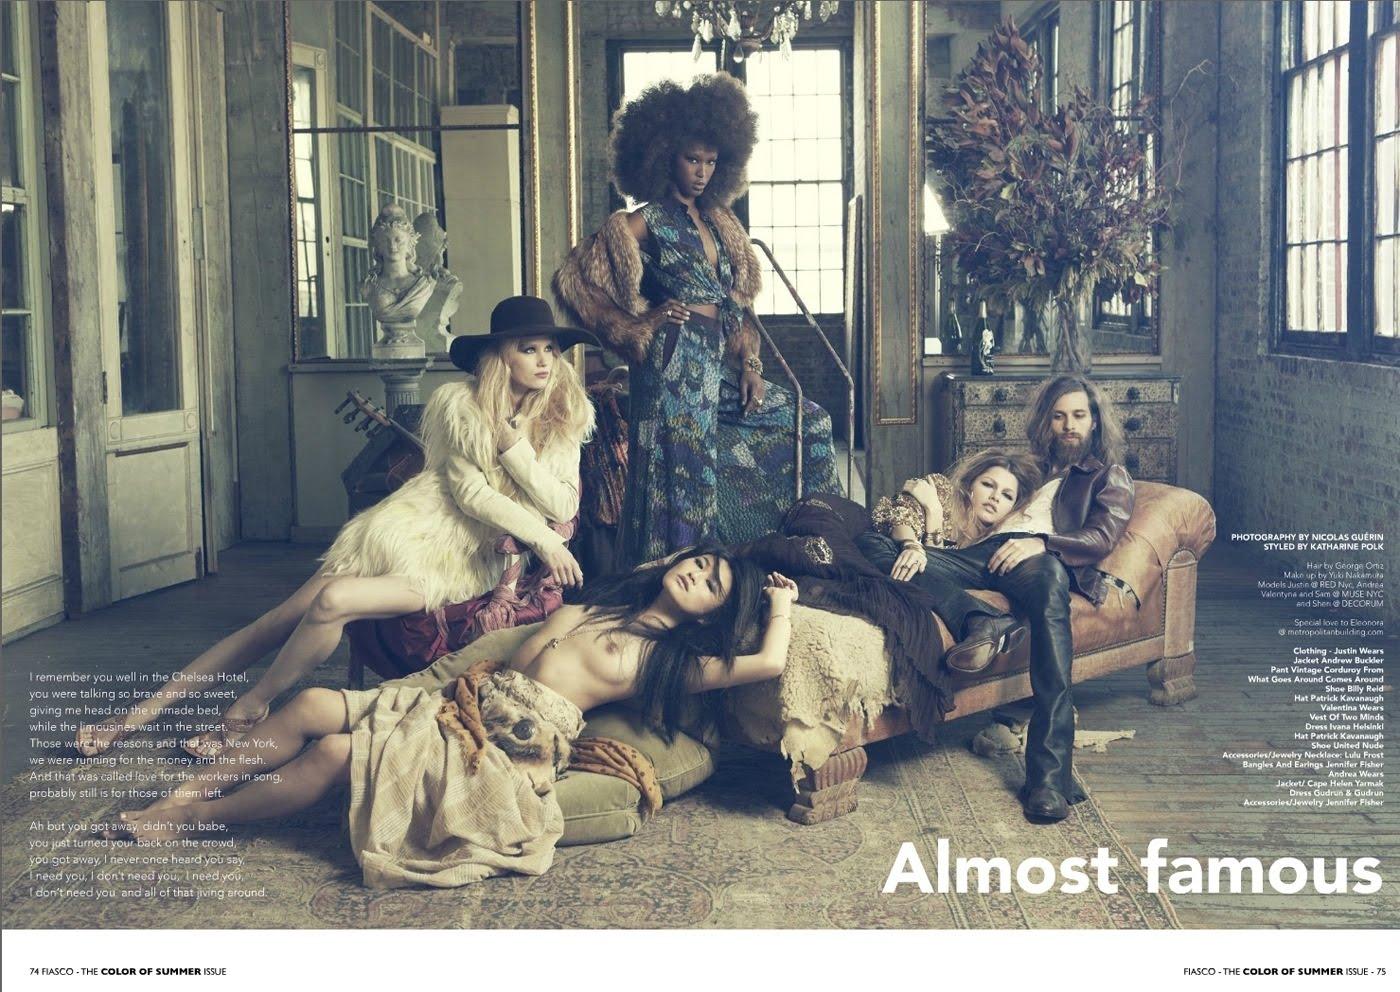 Assez LeatherJakt: Almost Famous (CAUTION.hippie.nudity.ahead) QH82